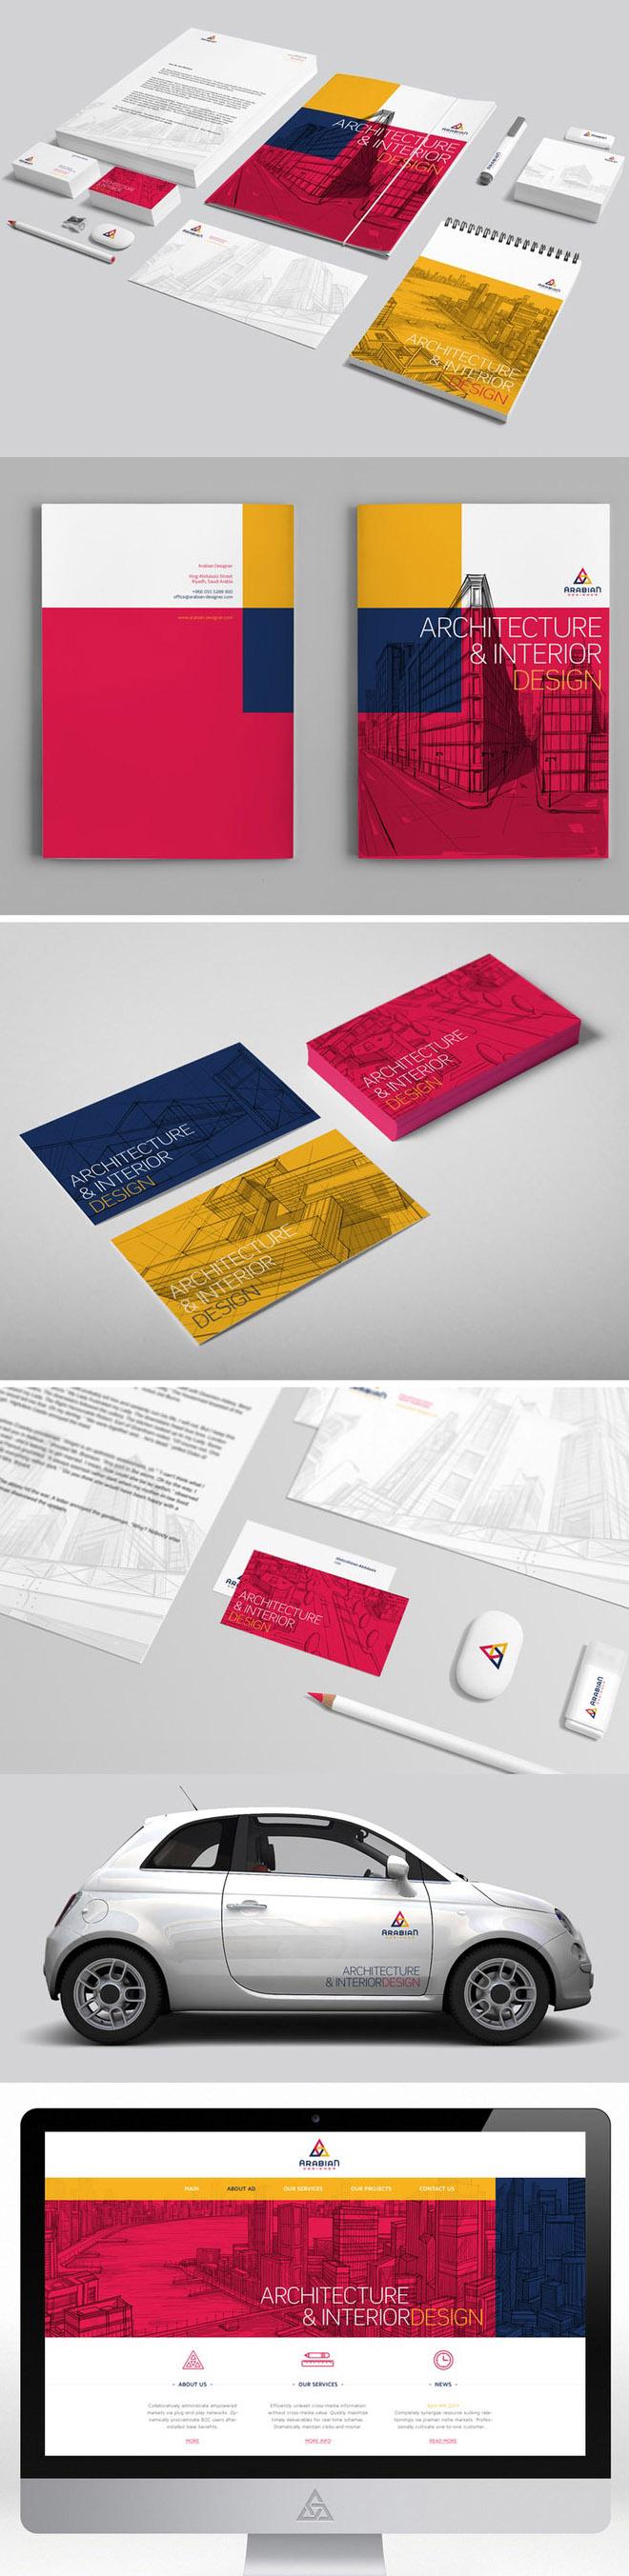 21-architecture-interior-branding-identity-design